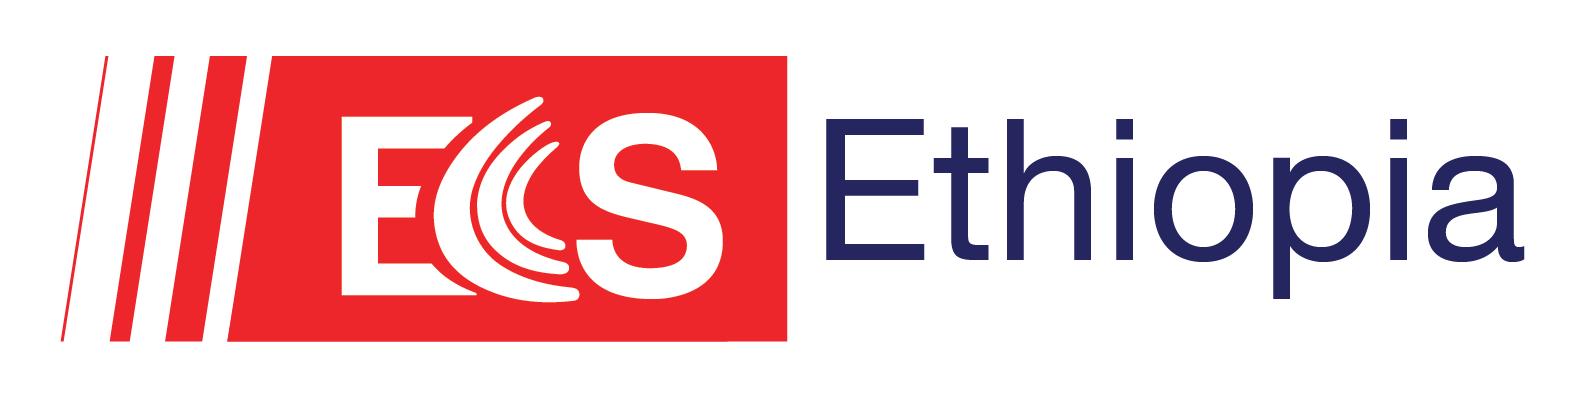 ECS Ethiopia